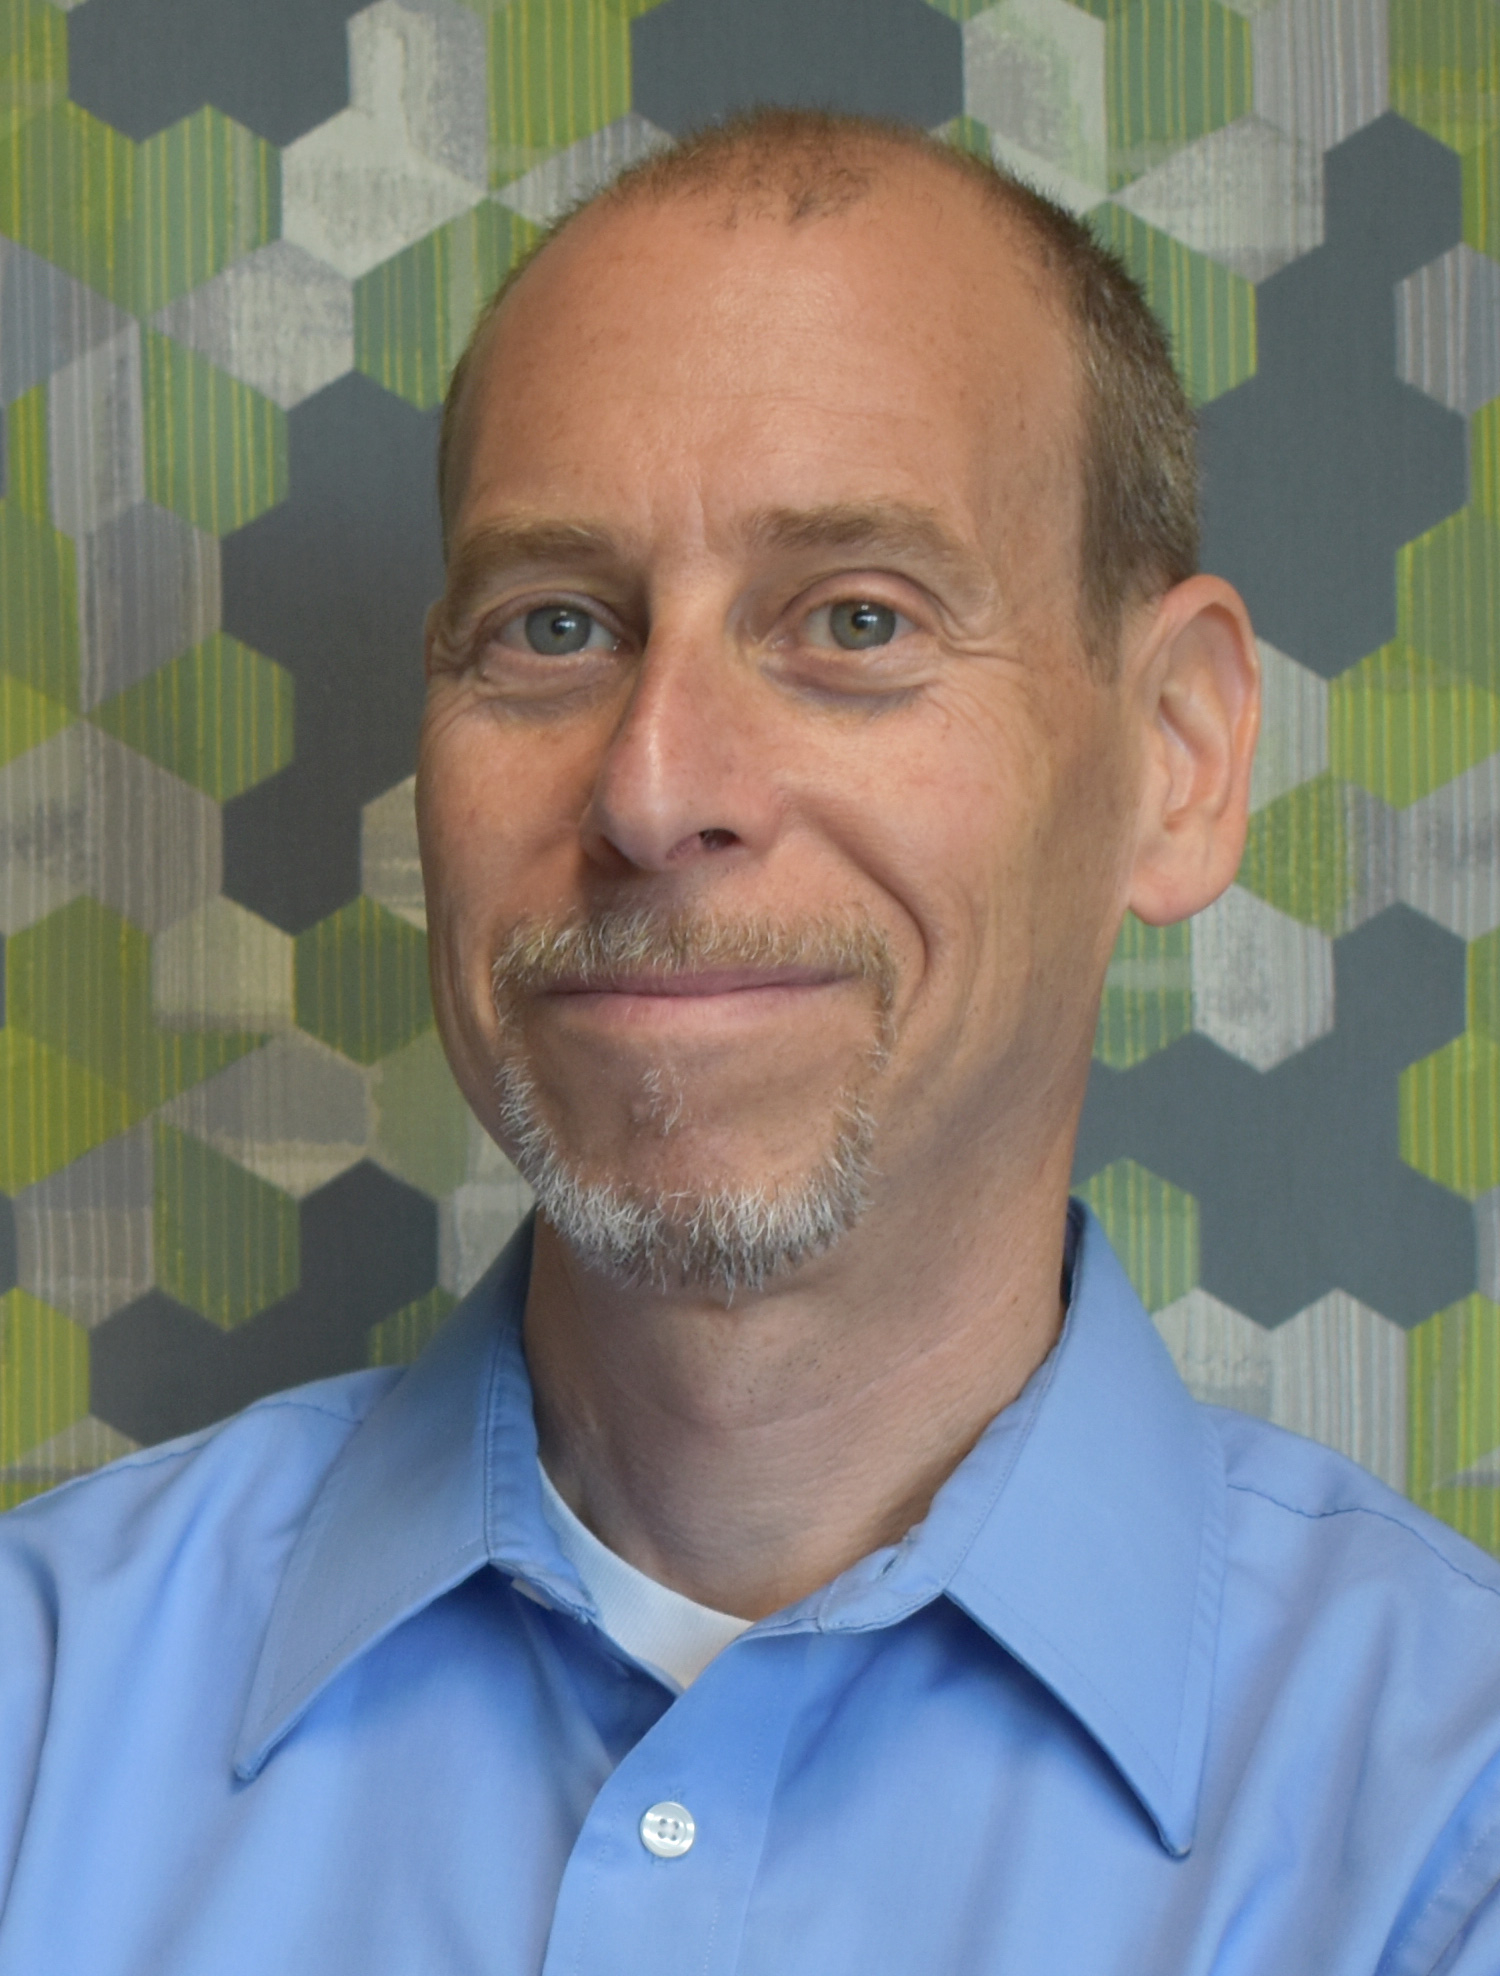 Seth Penchansky, AIA, LEED AP BD+C